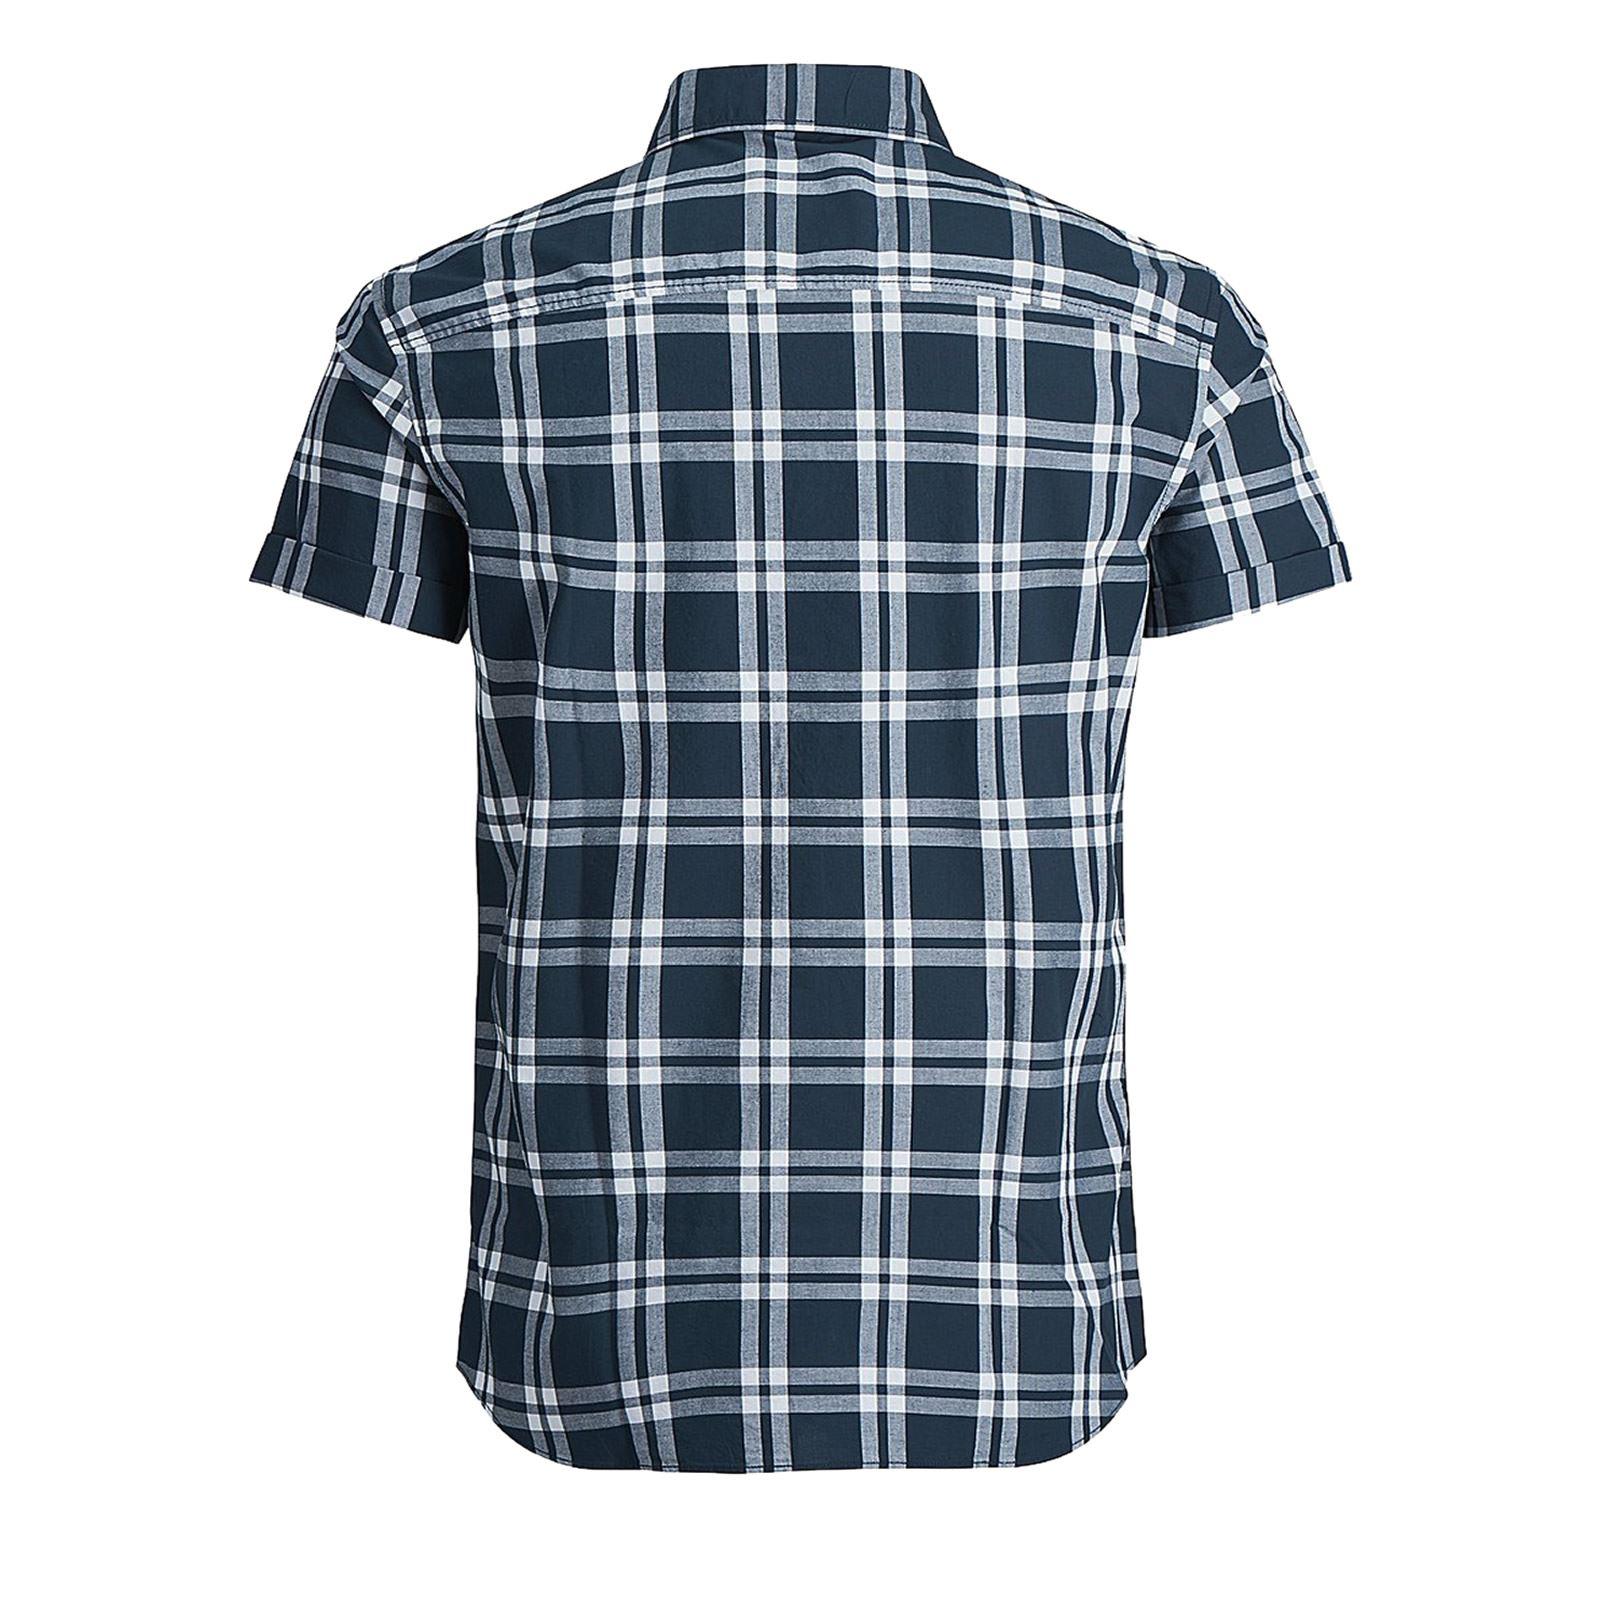 JACK-amp-JONES-Fischer-Mens-Check-Shirt-Collared-Short-Sleeve-Casual-Top thumbnail 5